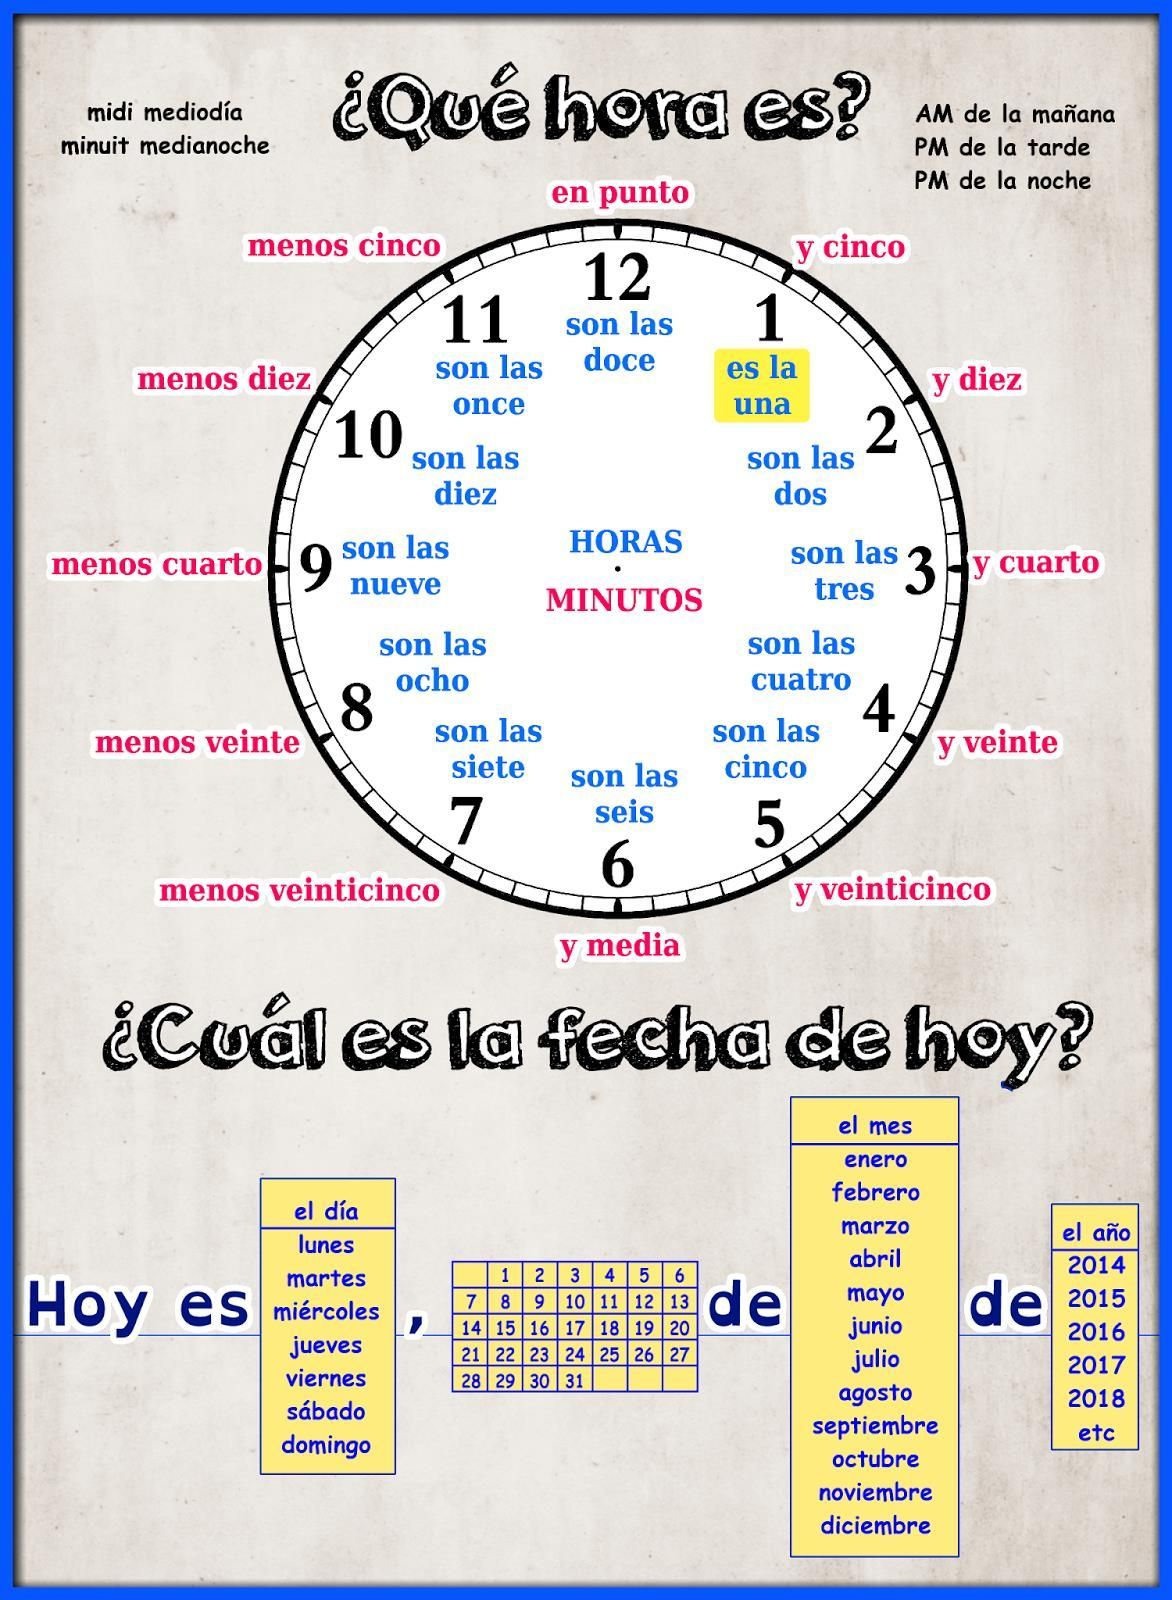 La Hora Y Fecha Spanishinfographic